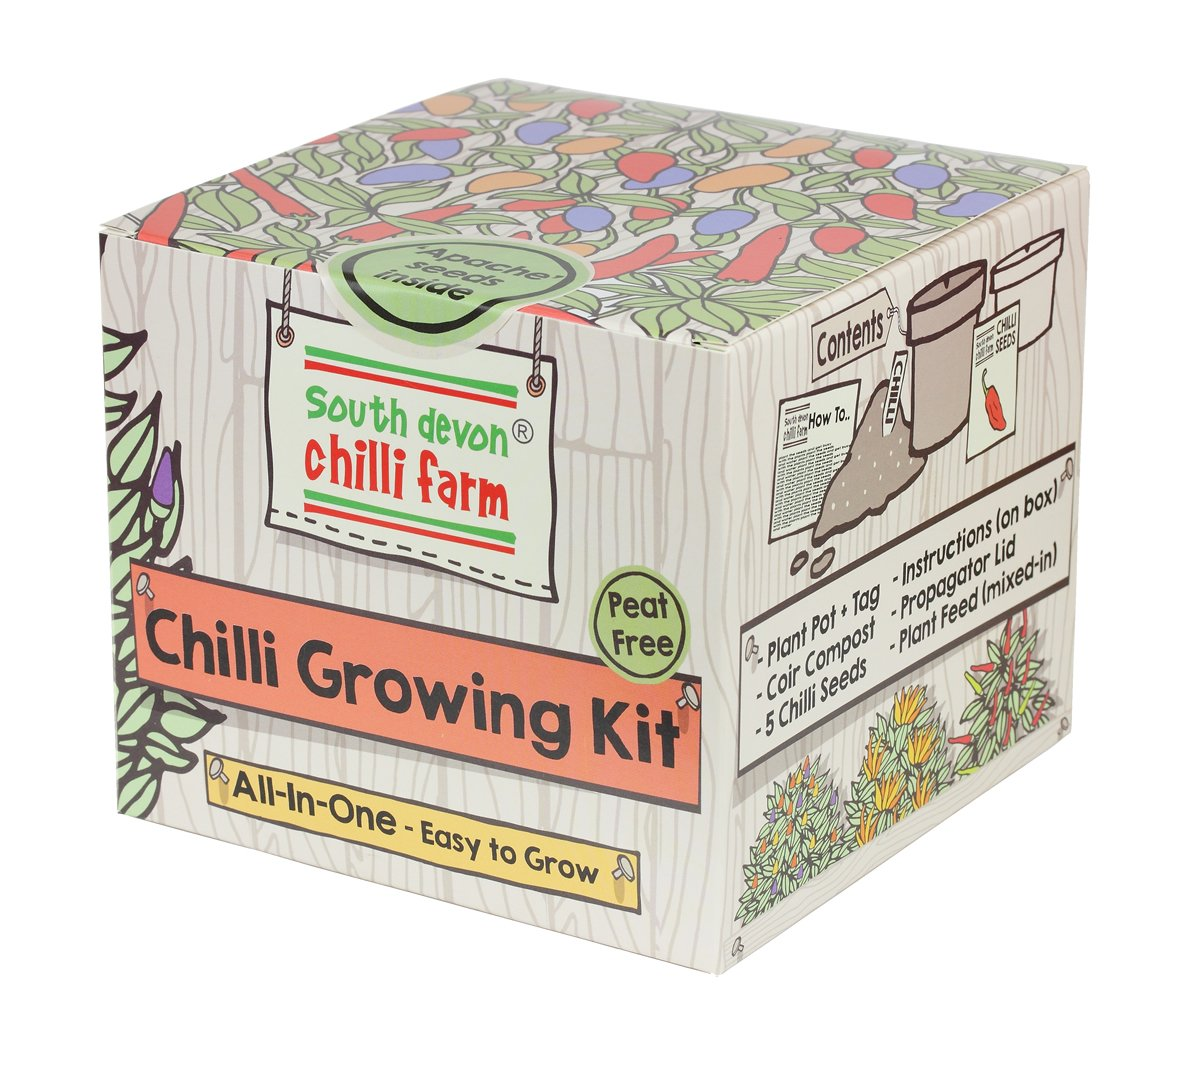 Chilli Growing Kit South Devon Chilli Farm